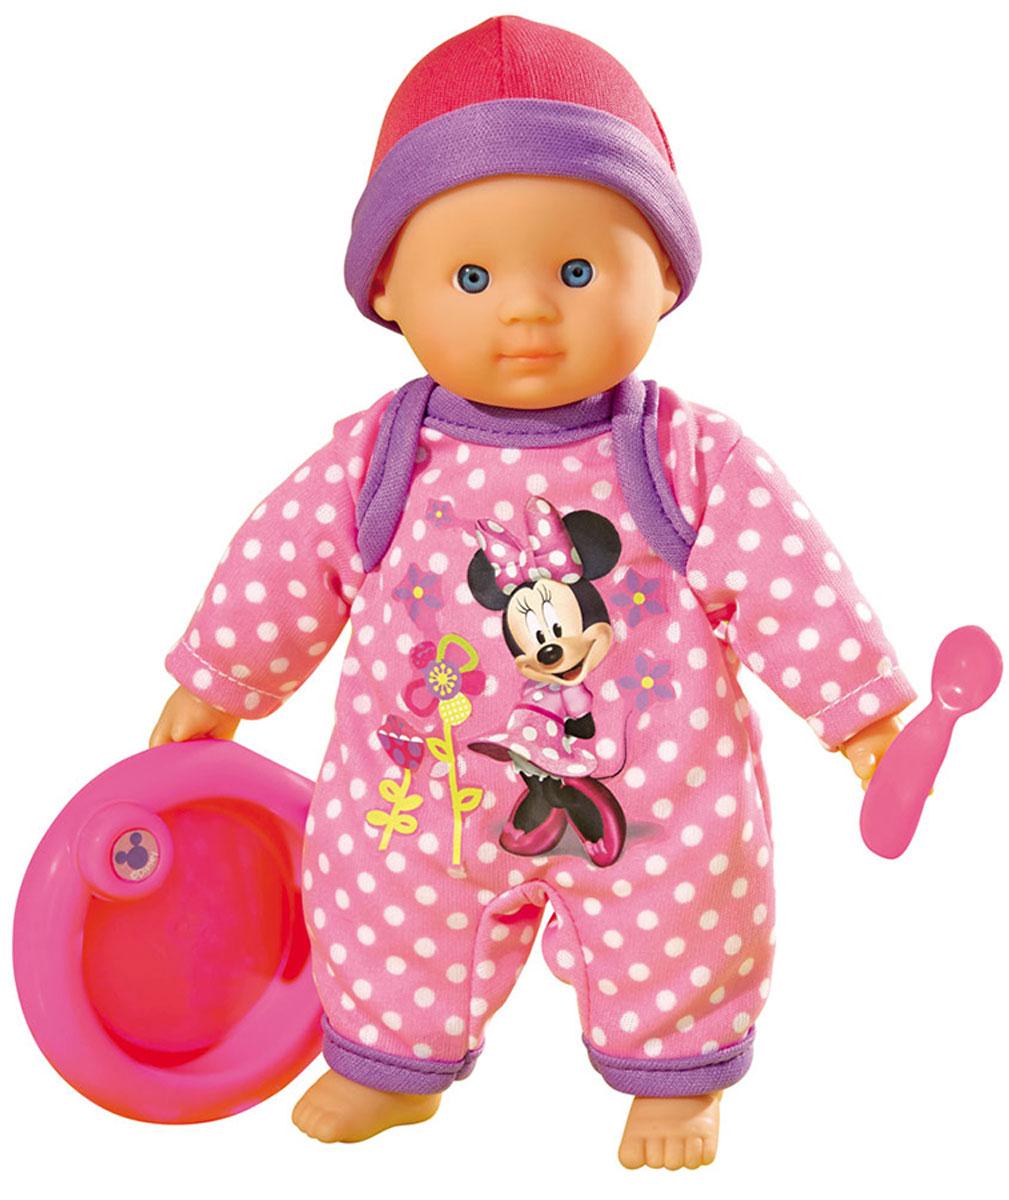 Simba Игровой набор с куклой Minnie Mouse Cute Baby simba пупс minnie mouse